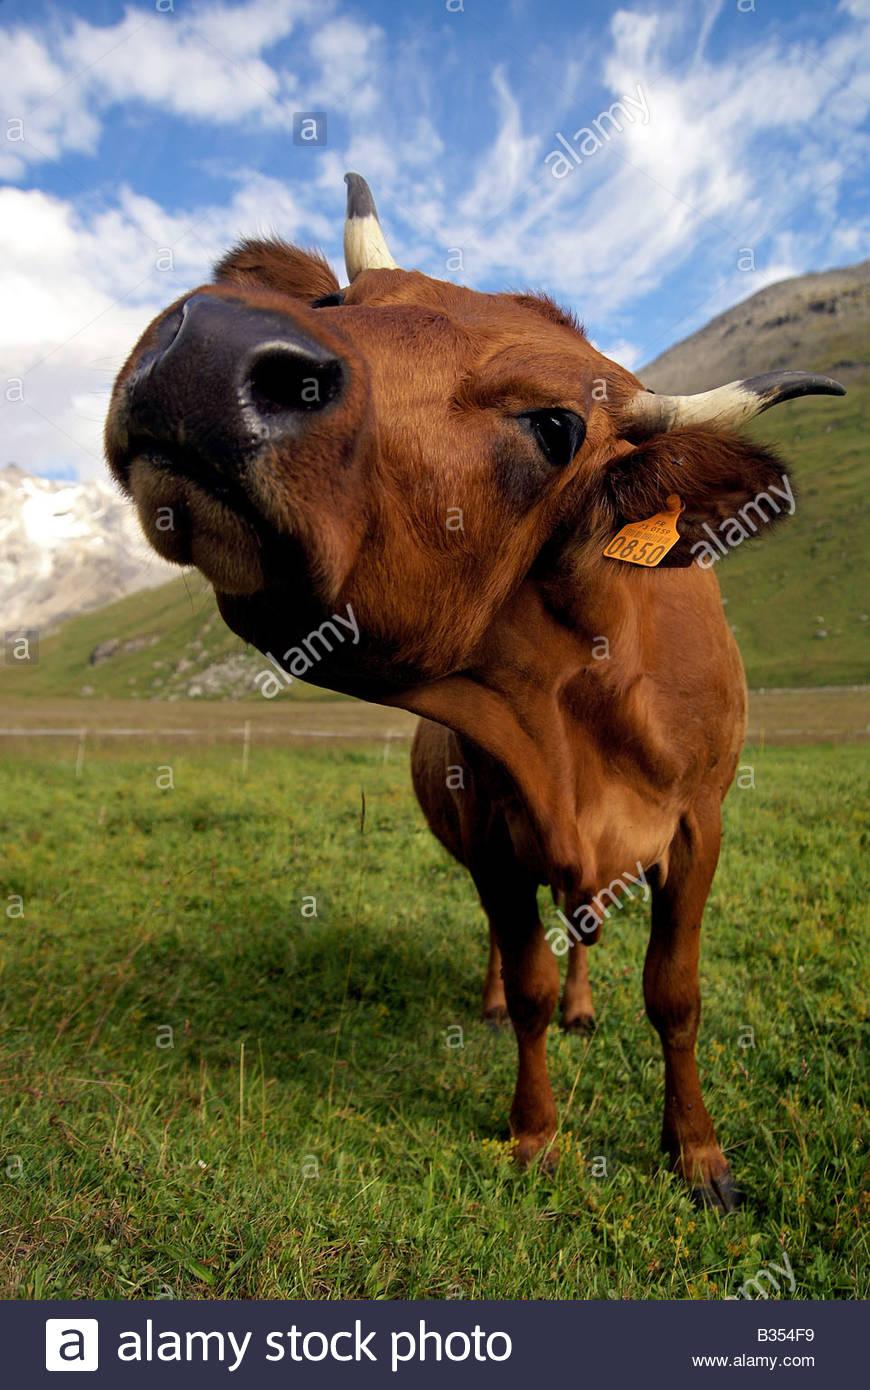 tarine-cow-closeup-gros-plan-dune-vache-